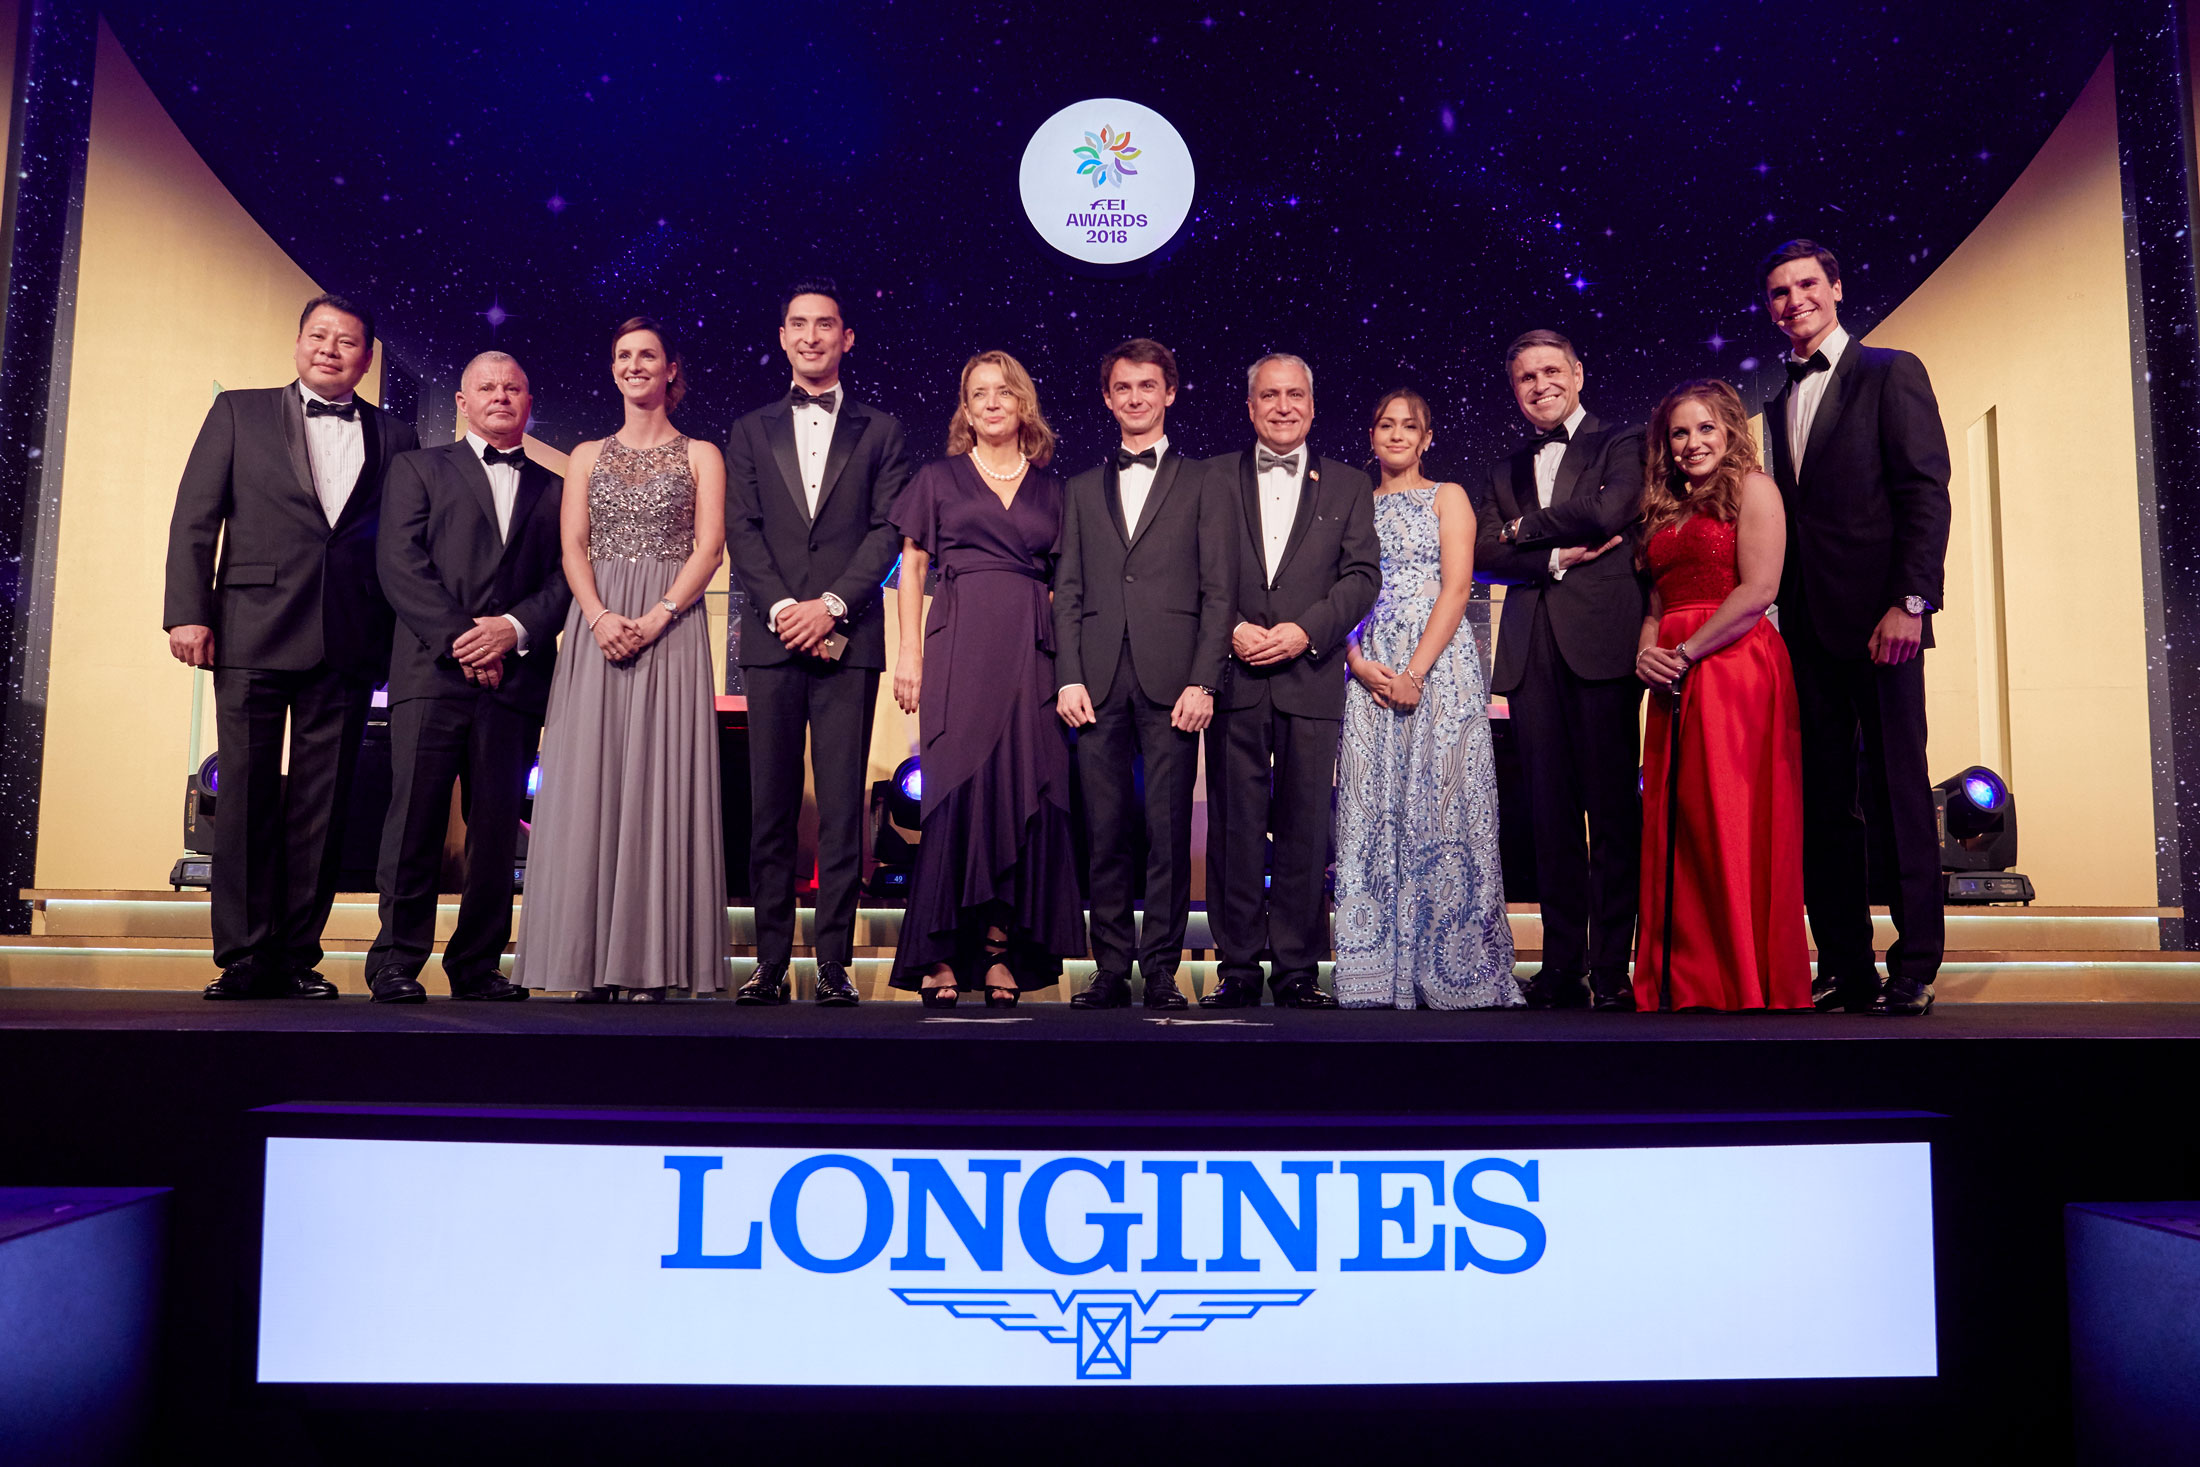 FEI Awards 2018 Winners Announced